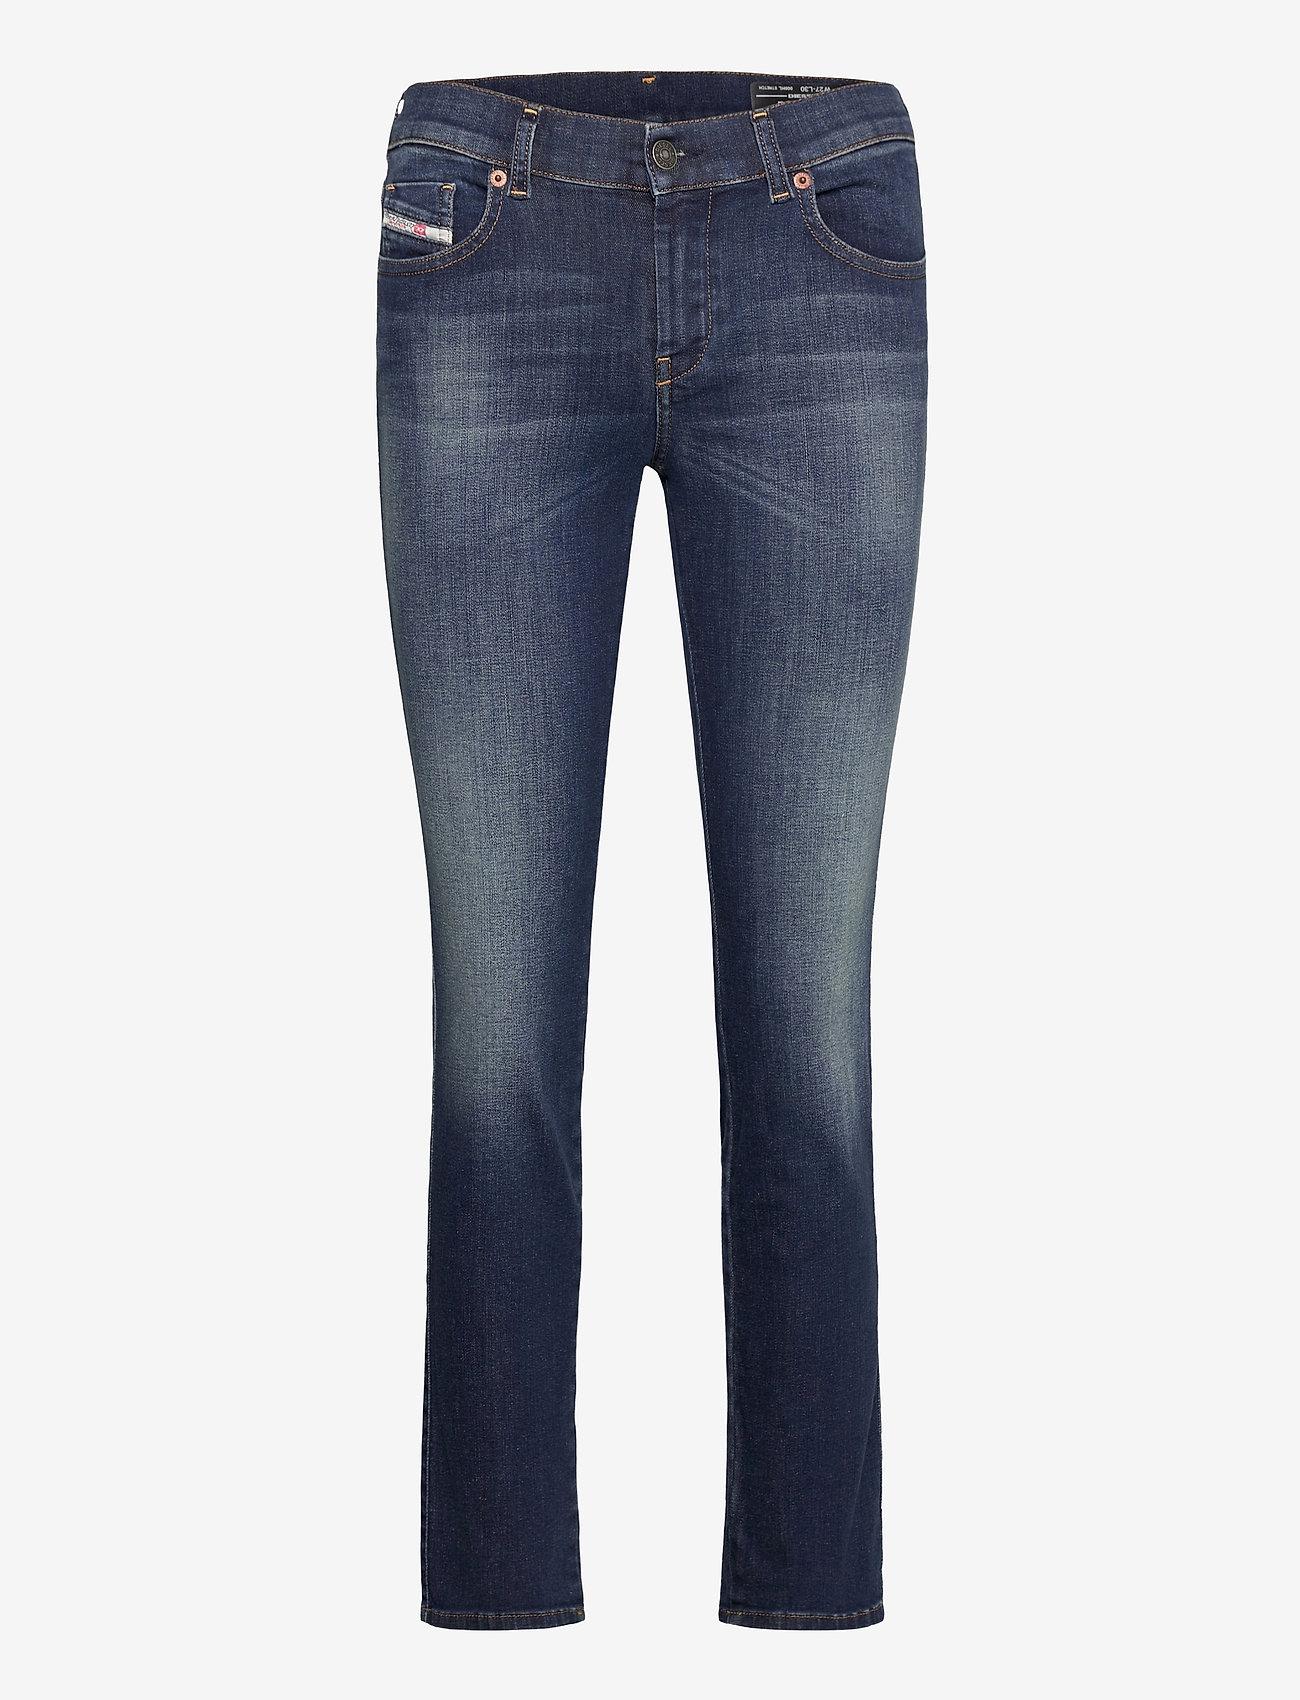 Diesel Women - D-SANDY L.30 TROUSERS - slim jeans - blue denim - 0